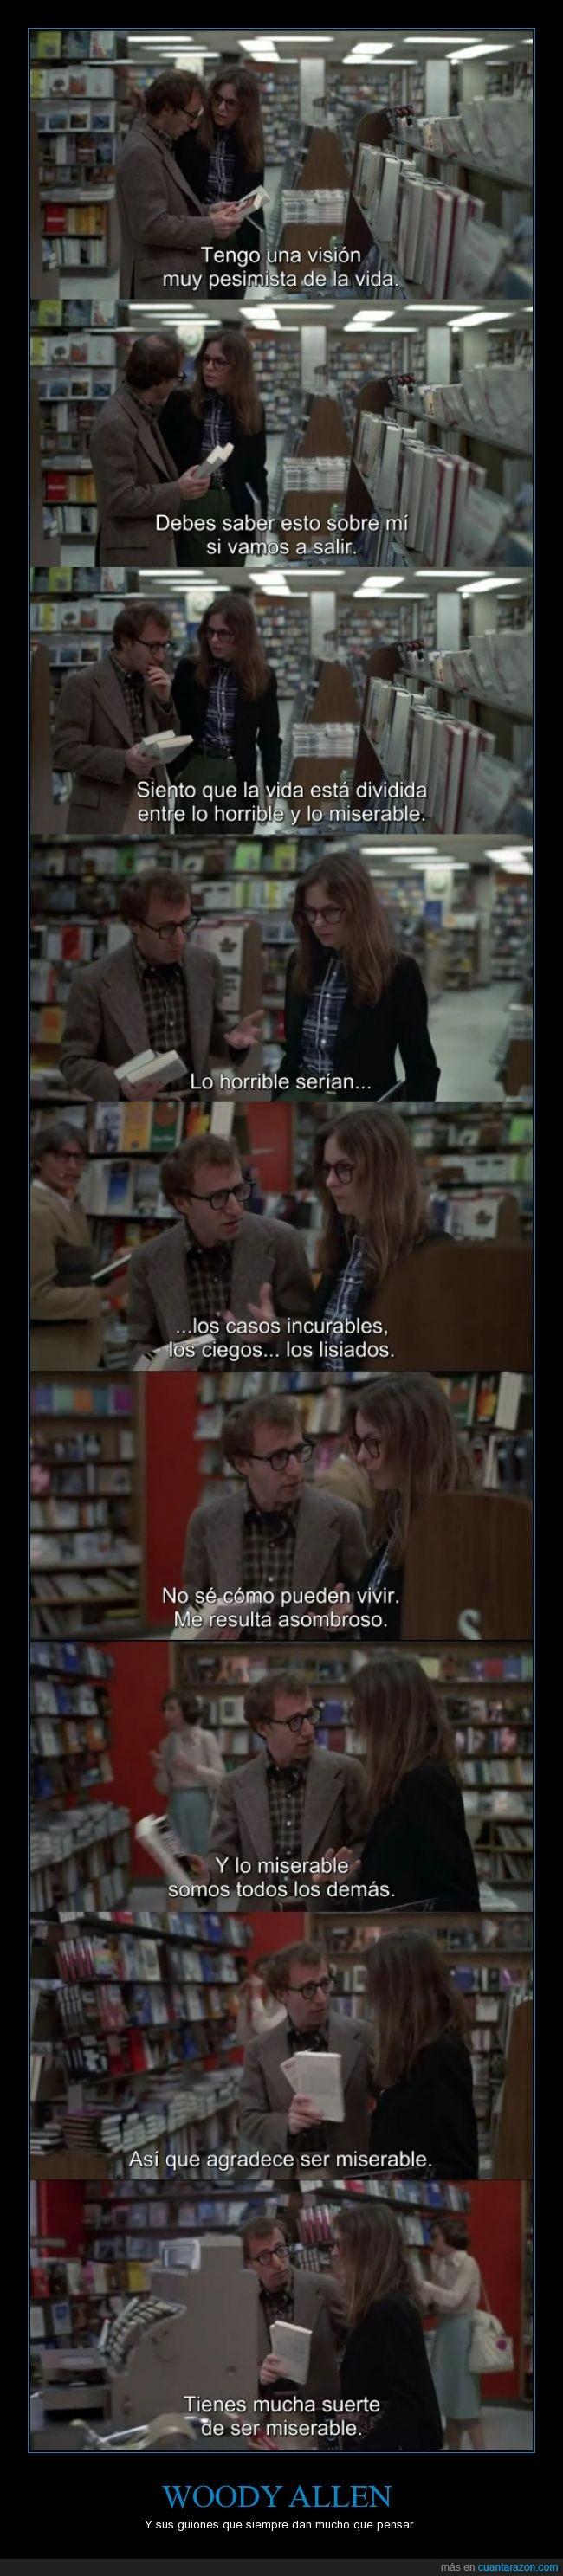 Alvy Singer,Annie Hall,guión,horrible,miserable,pesimismo,pesimista,suerte,Woody Allen